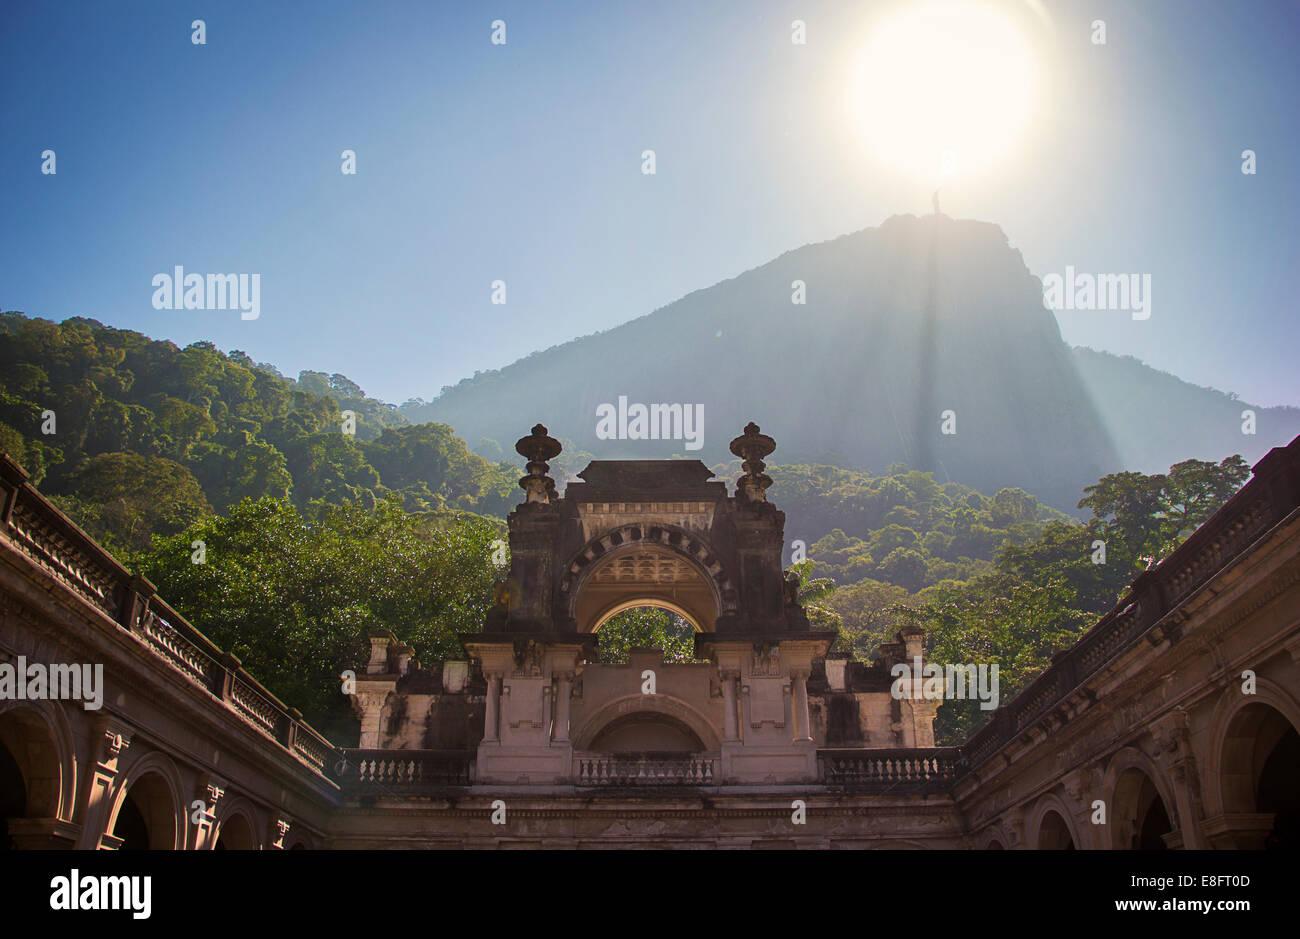 Fernblick über Christus-Erlöser-Statue, Rio De Janeiro, Brasilien Stockbild